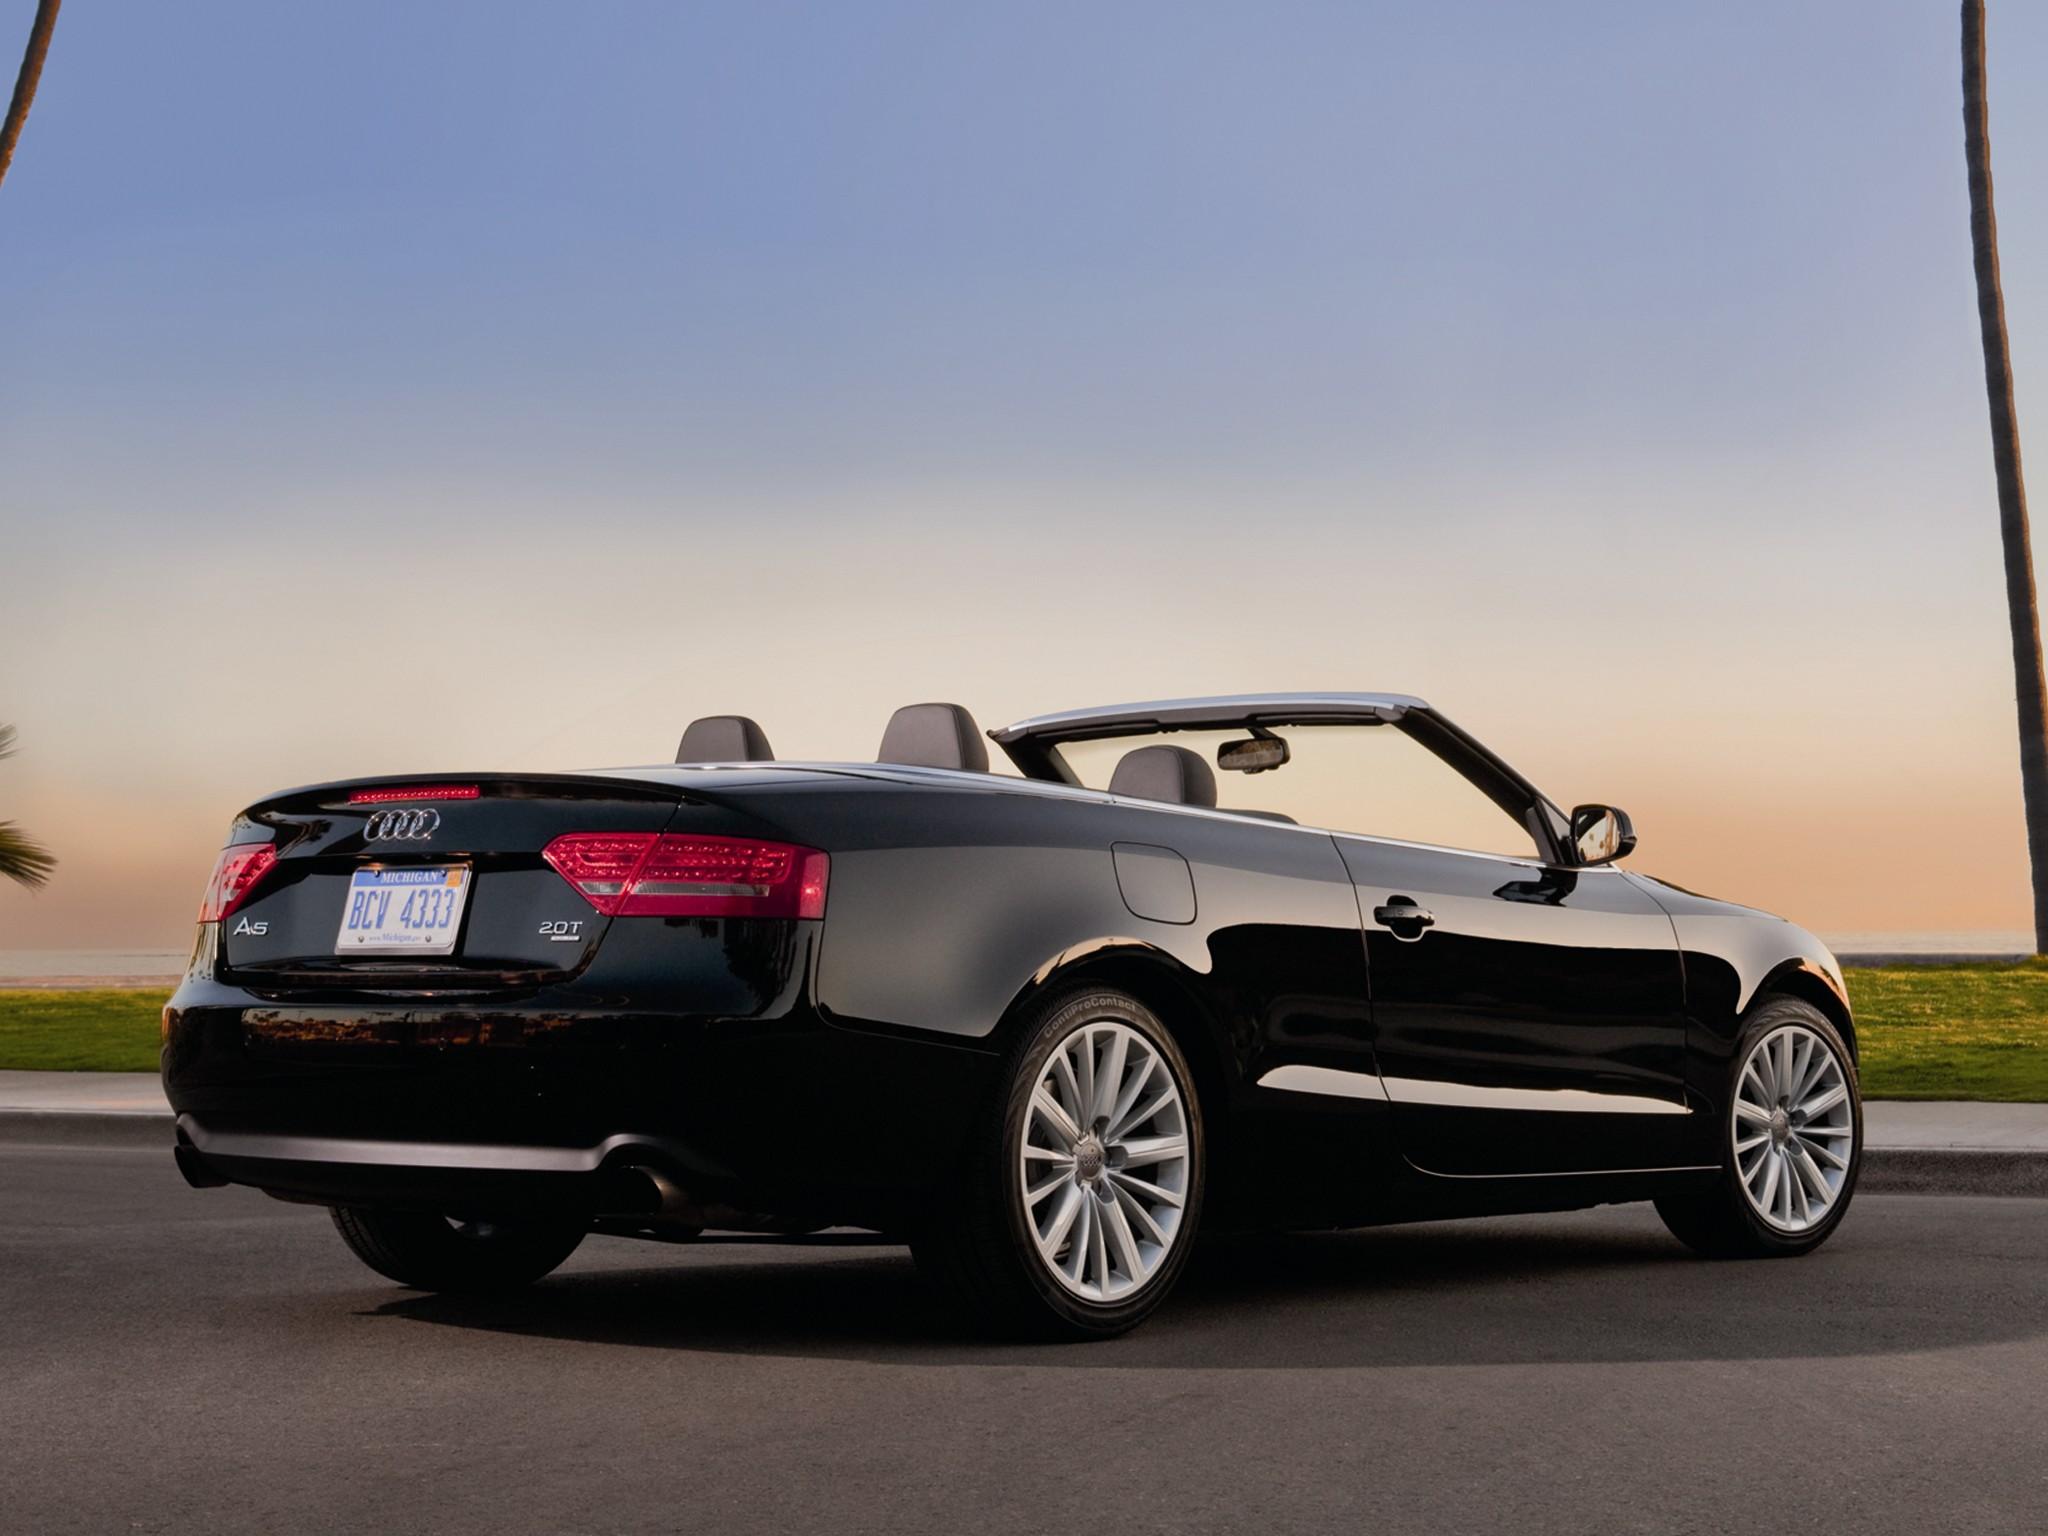 audi a5 cabriolet specs 2009 2010 2011 2012 autoevolution. Black Bedroom Furniture Sets. Home Design Ideas